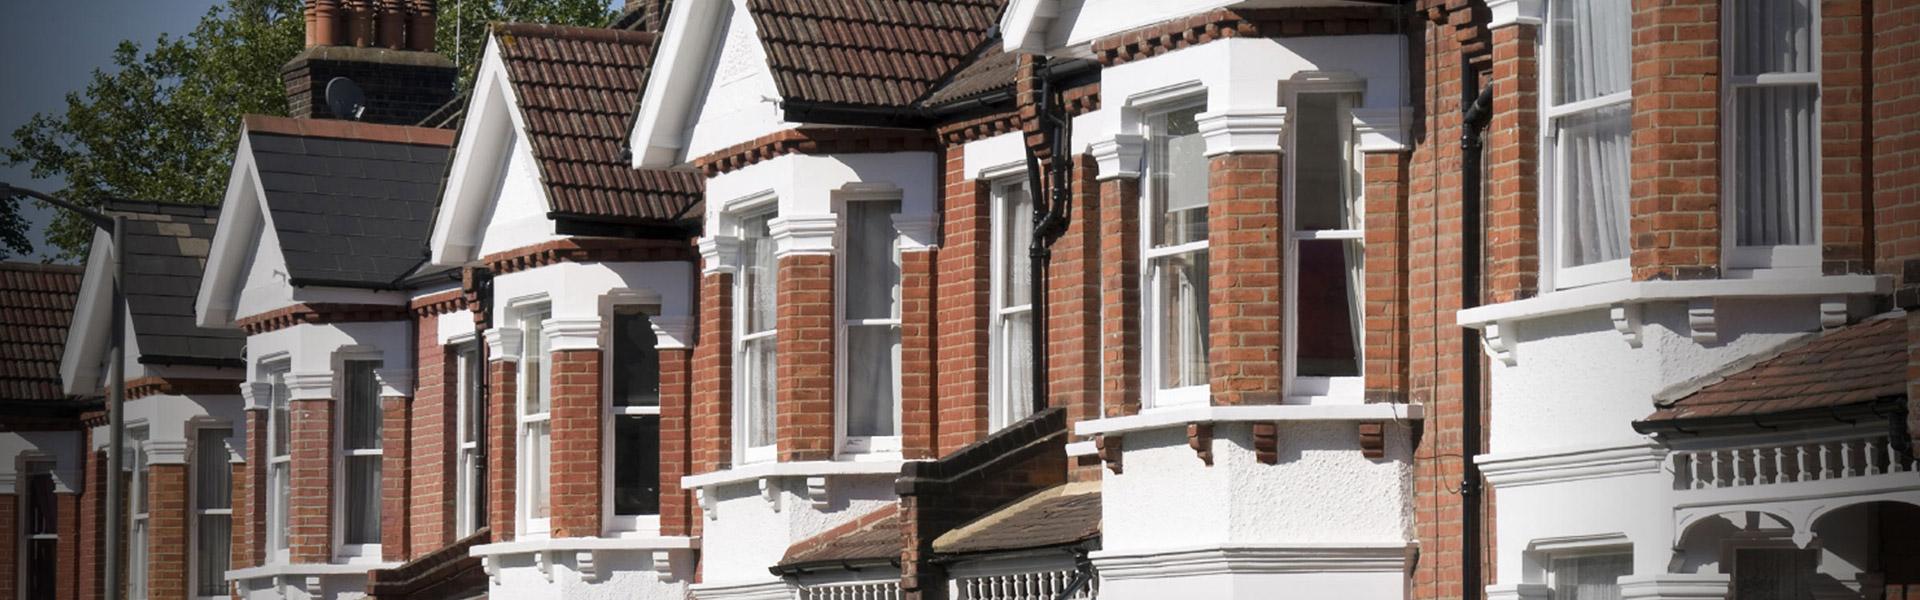 Terraced House Property Advice